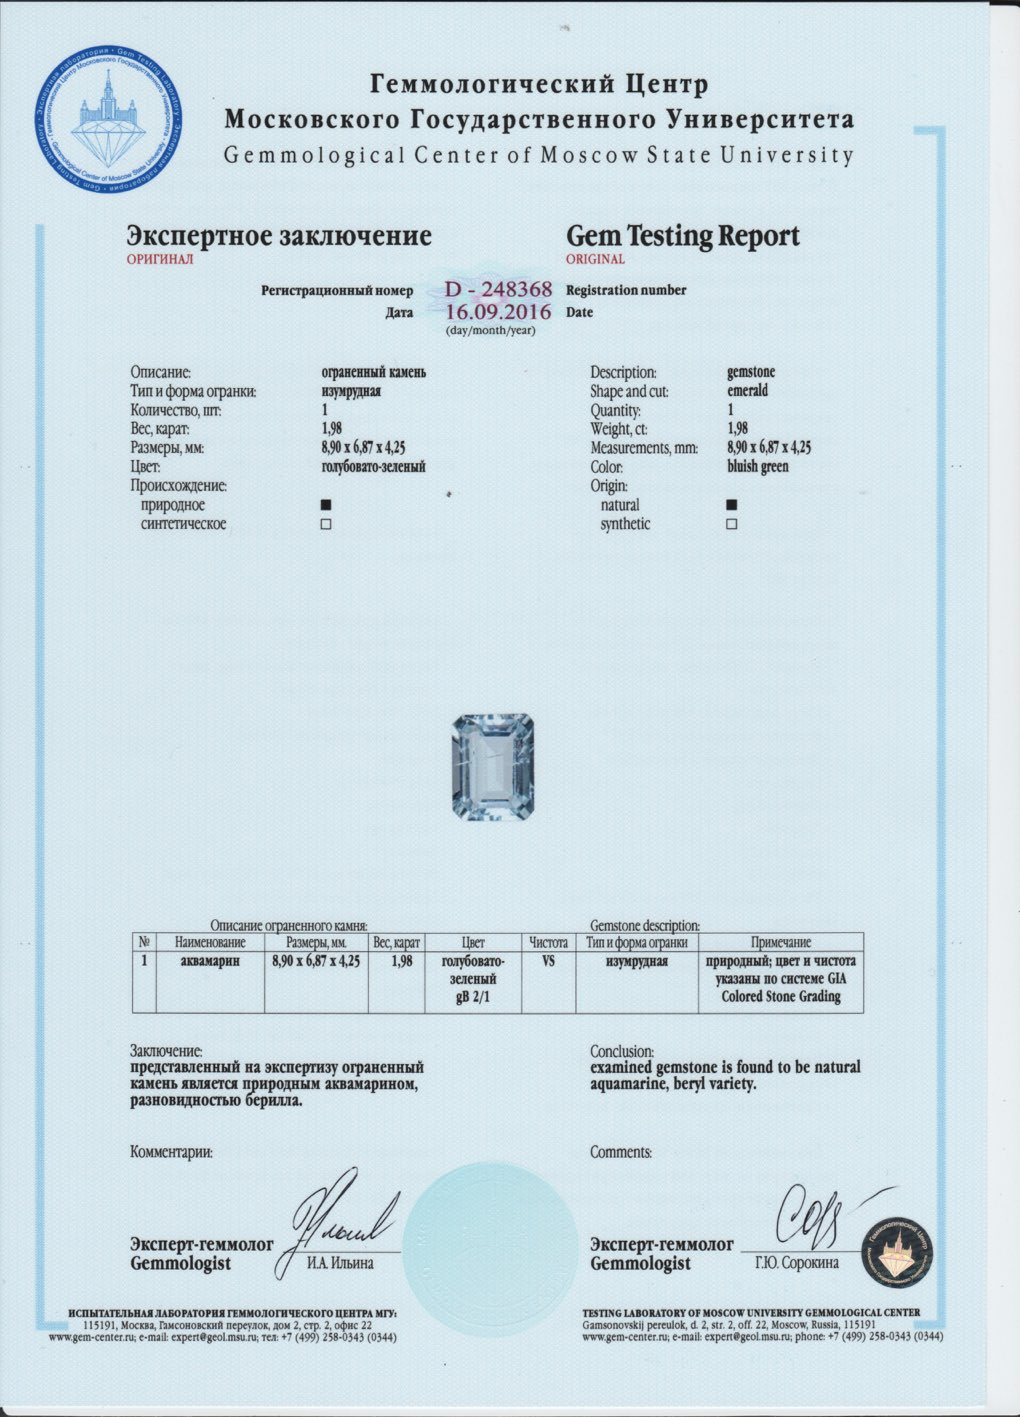 https://mineralmarket.ru/img/certificate/4/1485964391.jpeg